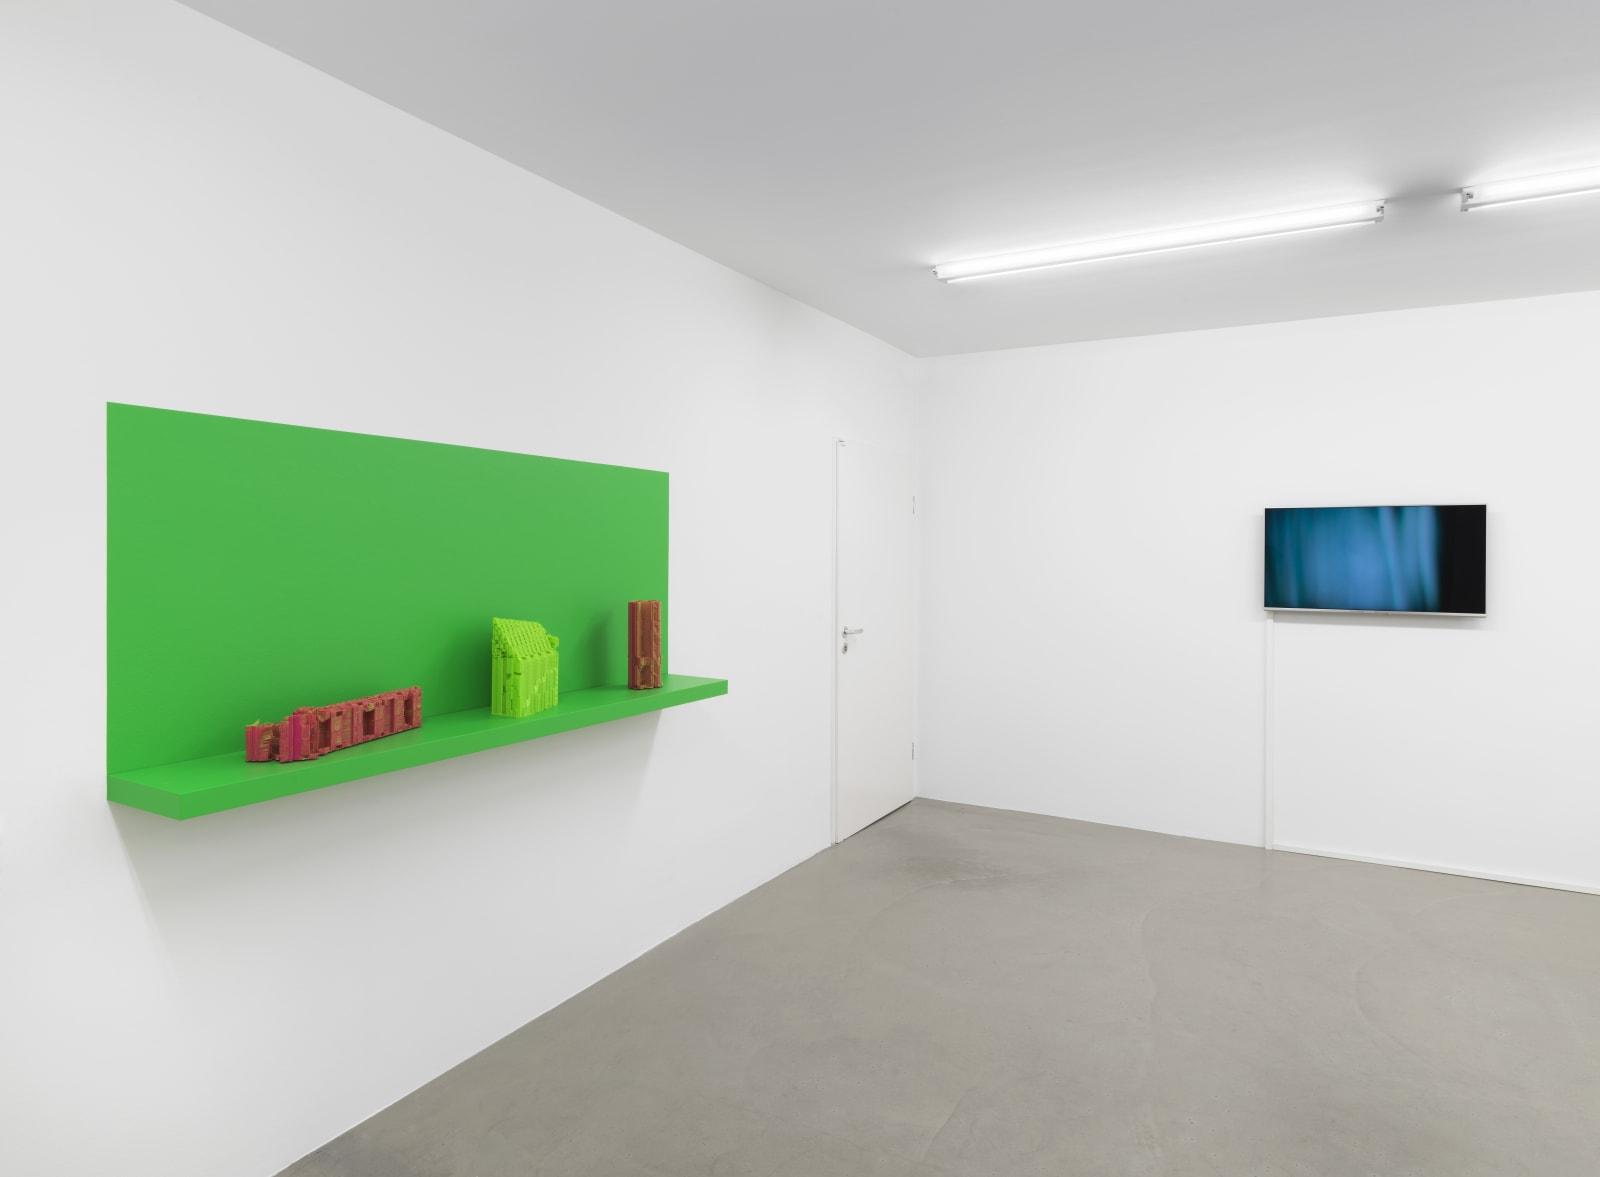 Studio Exhibition: Samson Young, April 28 - June 5, 2021 © the artists. Courtesy Capitain Petzel, Berlin. Ph: Jens Ziehe